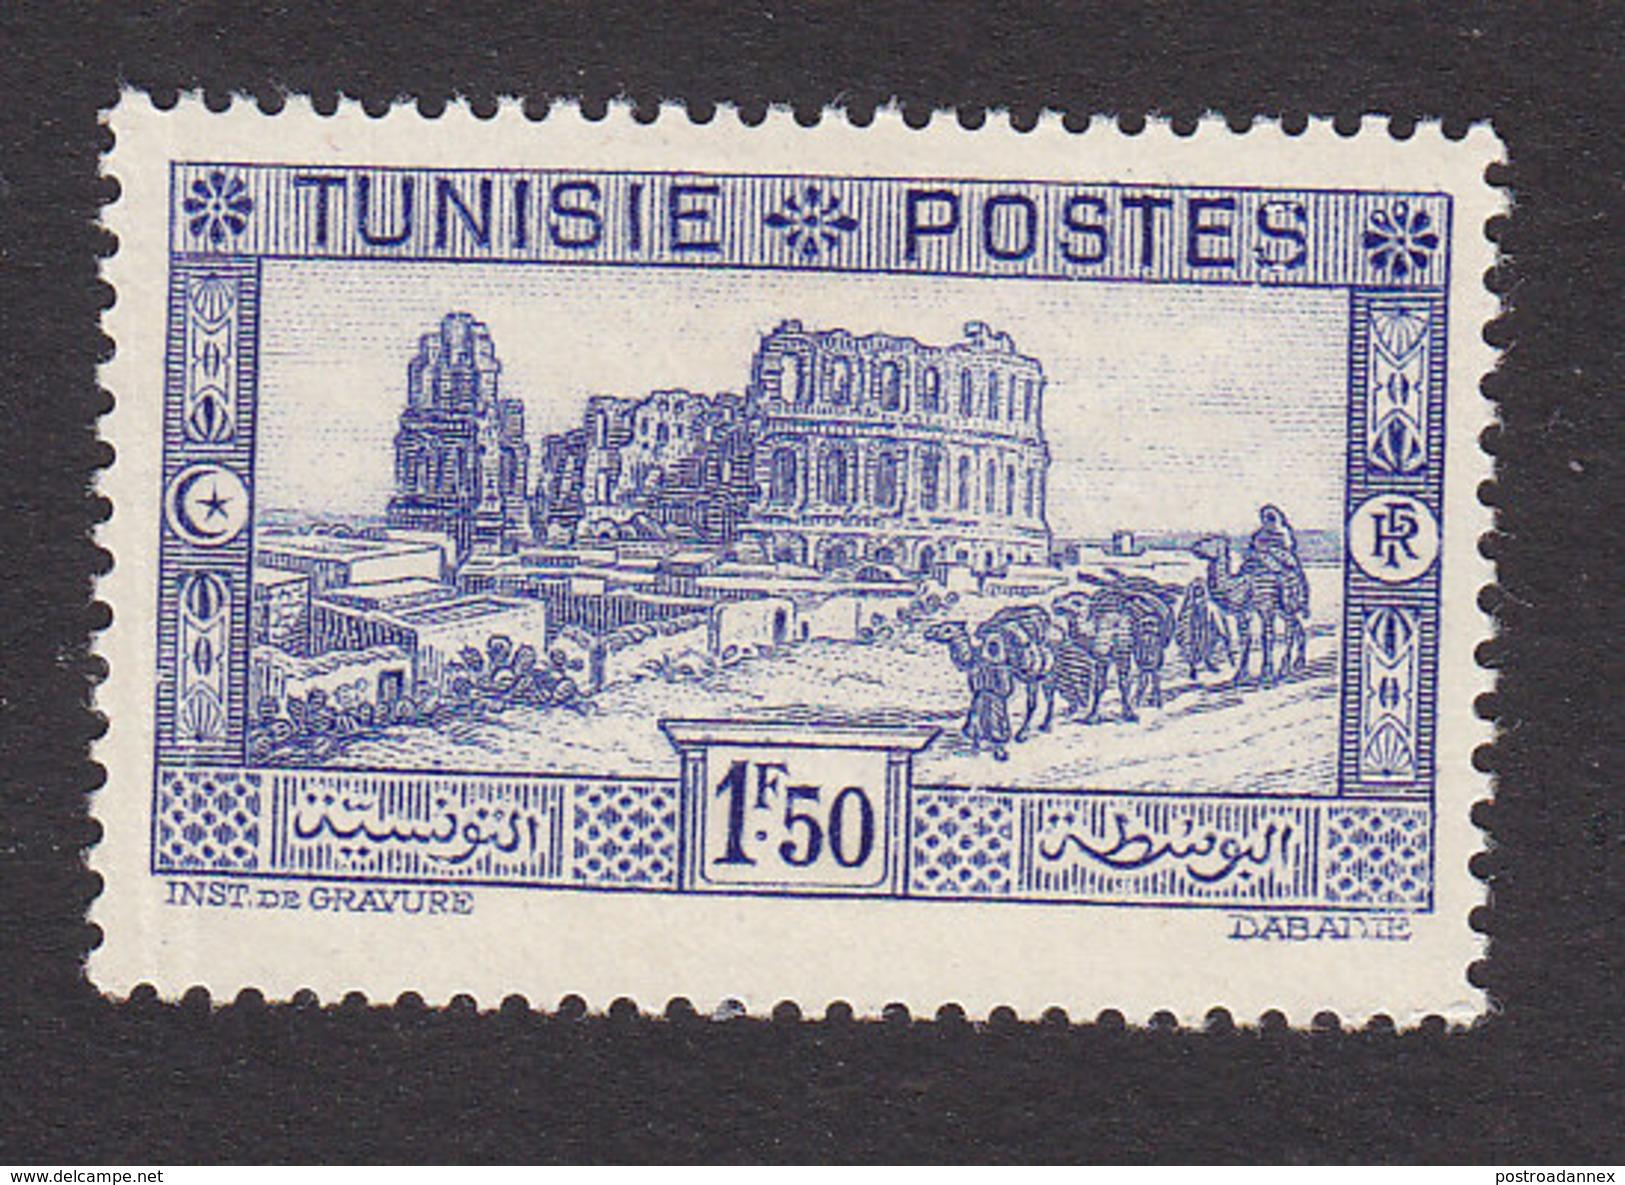 Tunisia, Scott #137, Mint Hinged, Roman Ampitheater, Issued 1931 - Unused Stamps